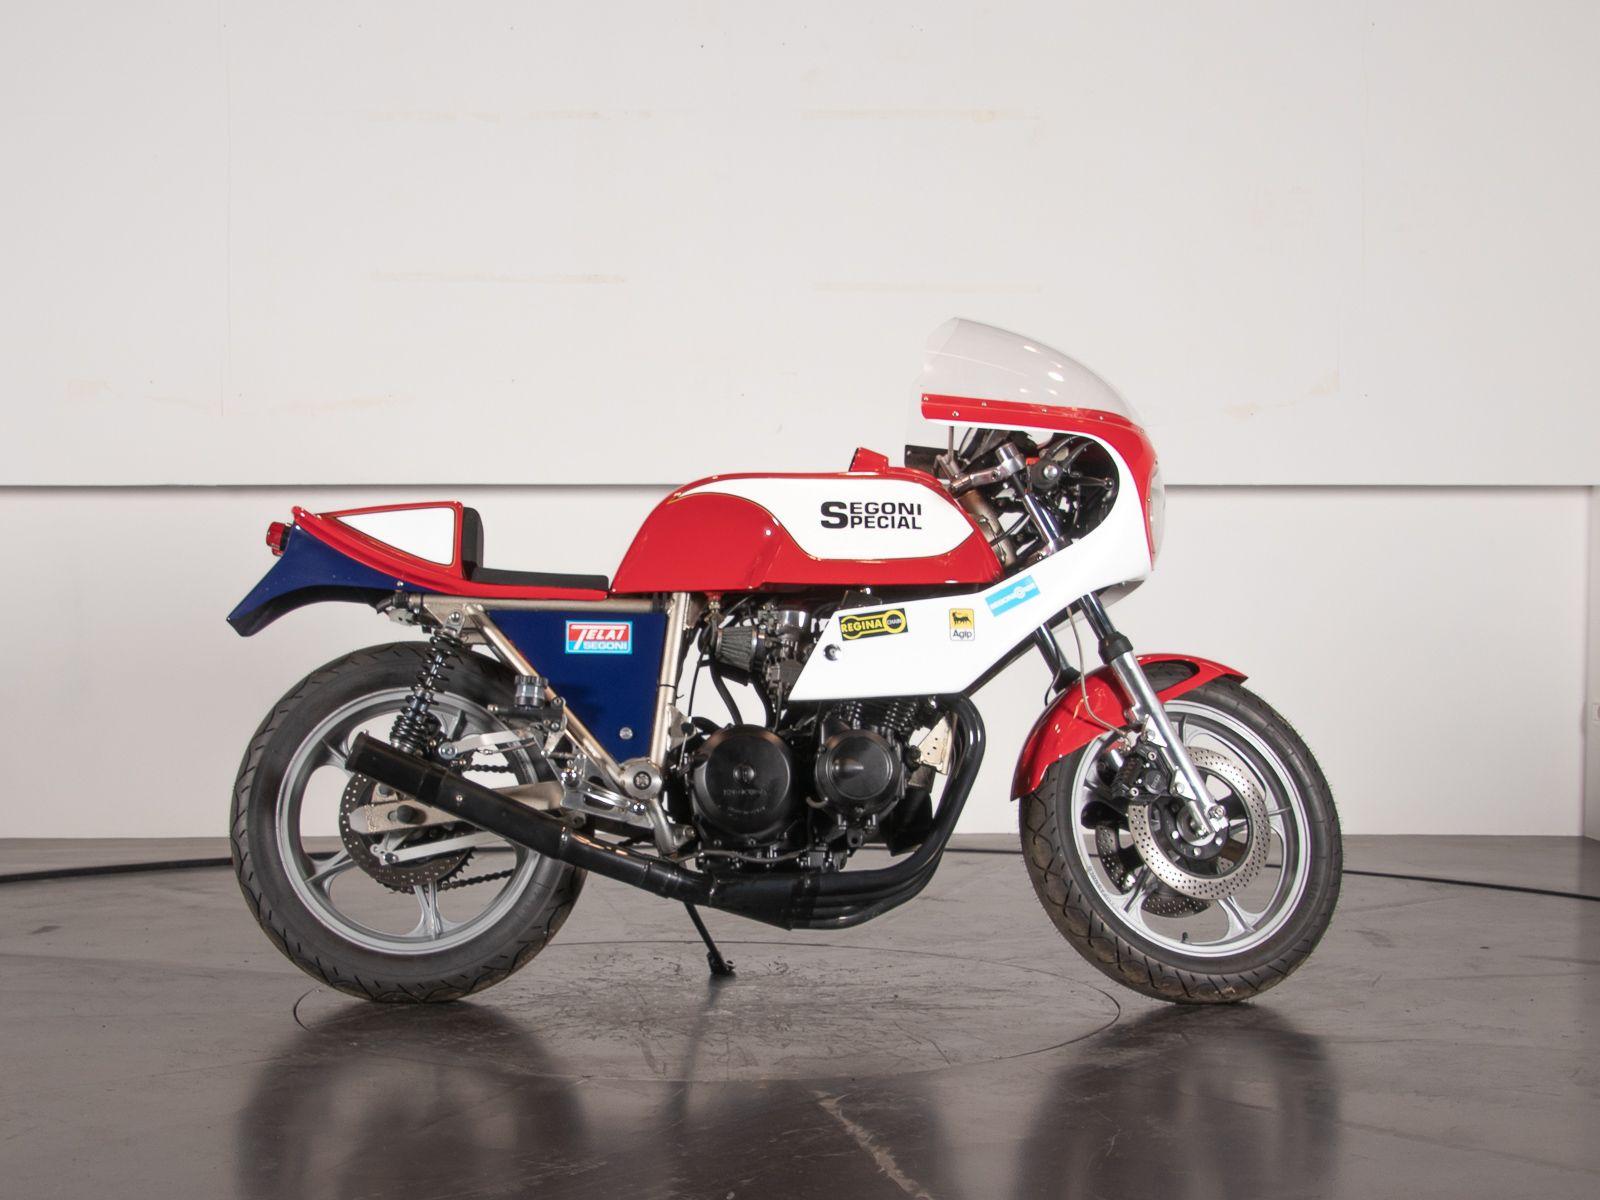 1984 Kawasaki Segoni 750 46337